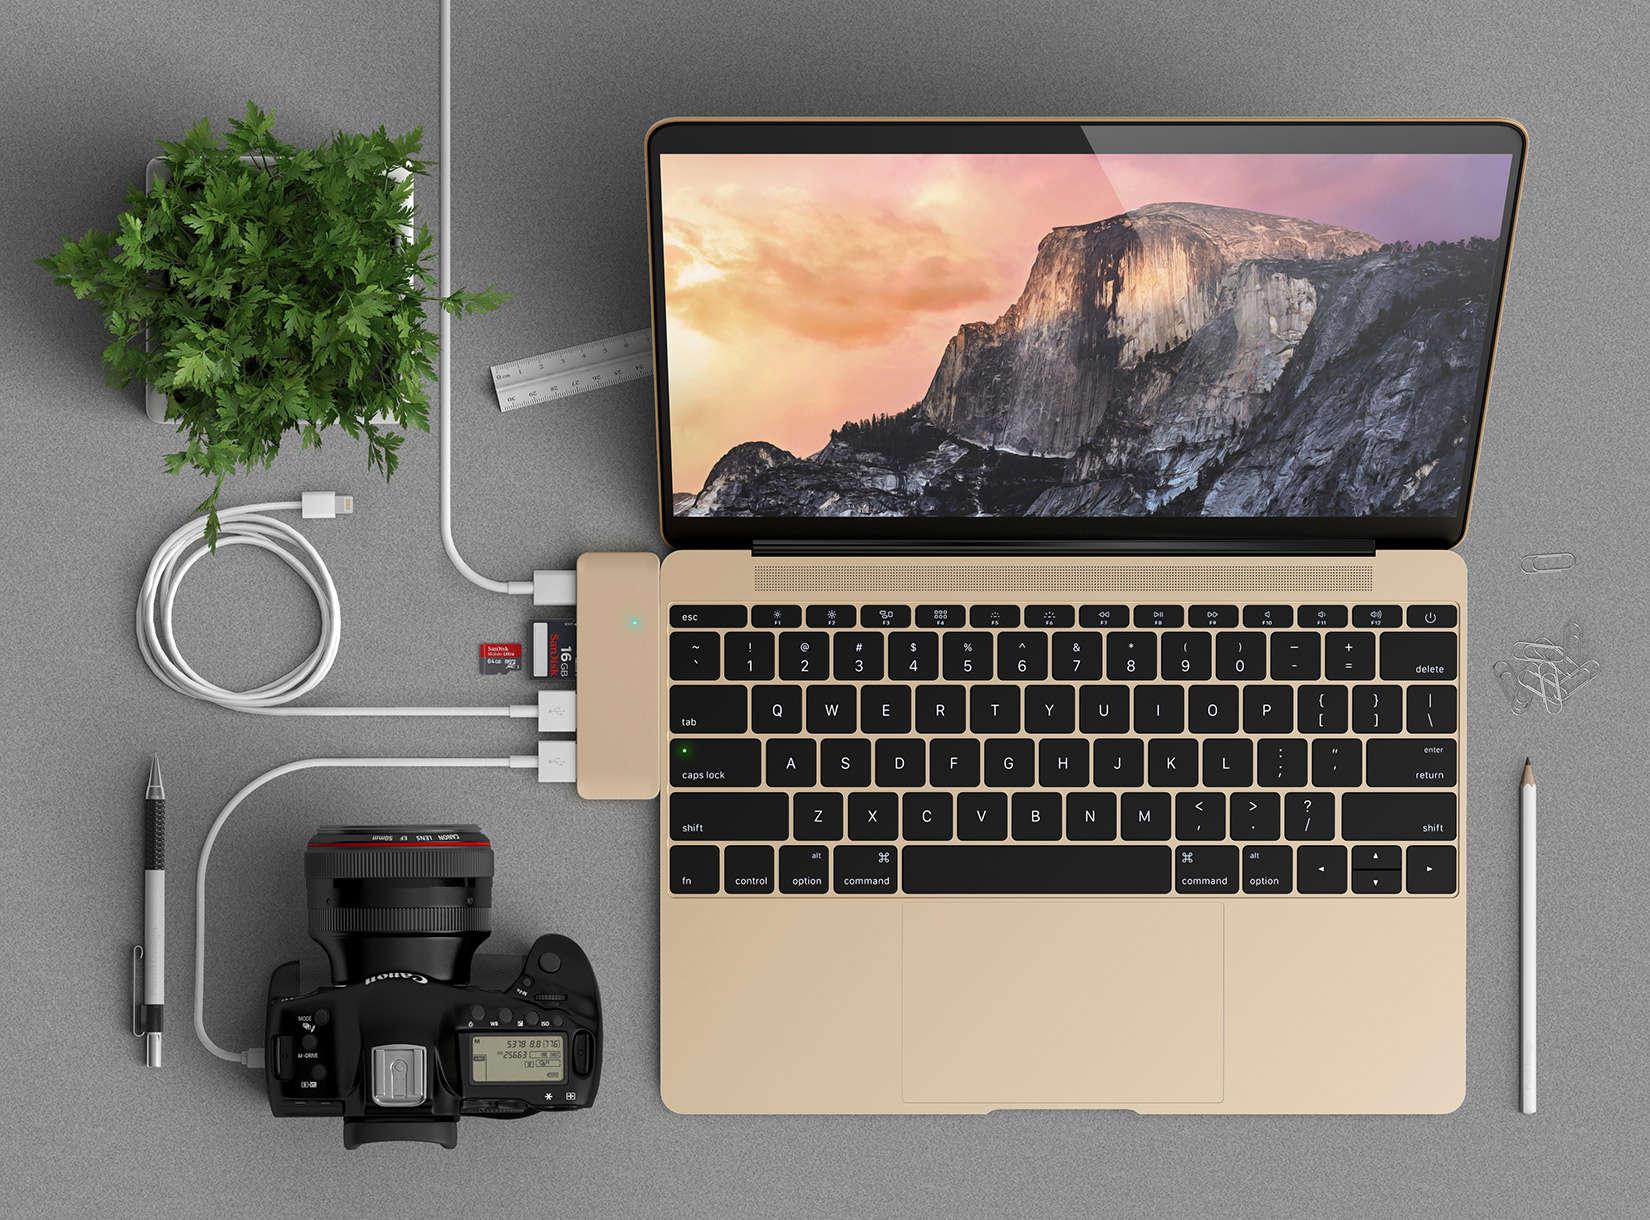 macbook-pro-usb-c-hub-by-satechi